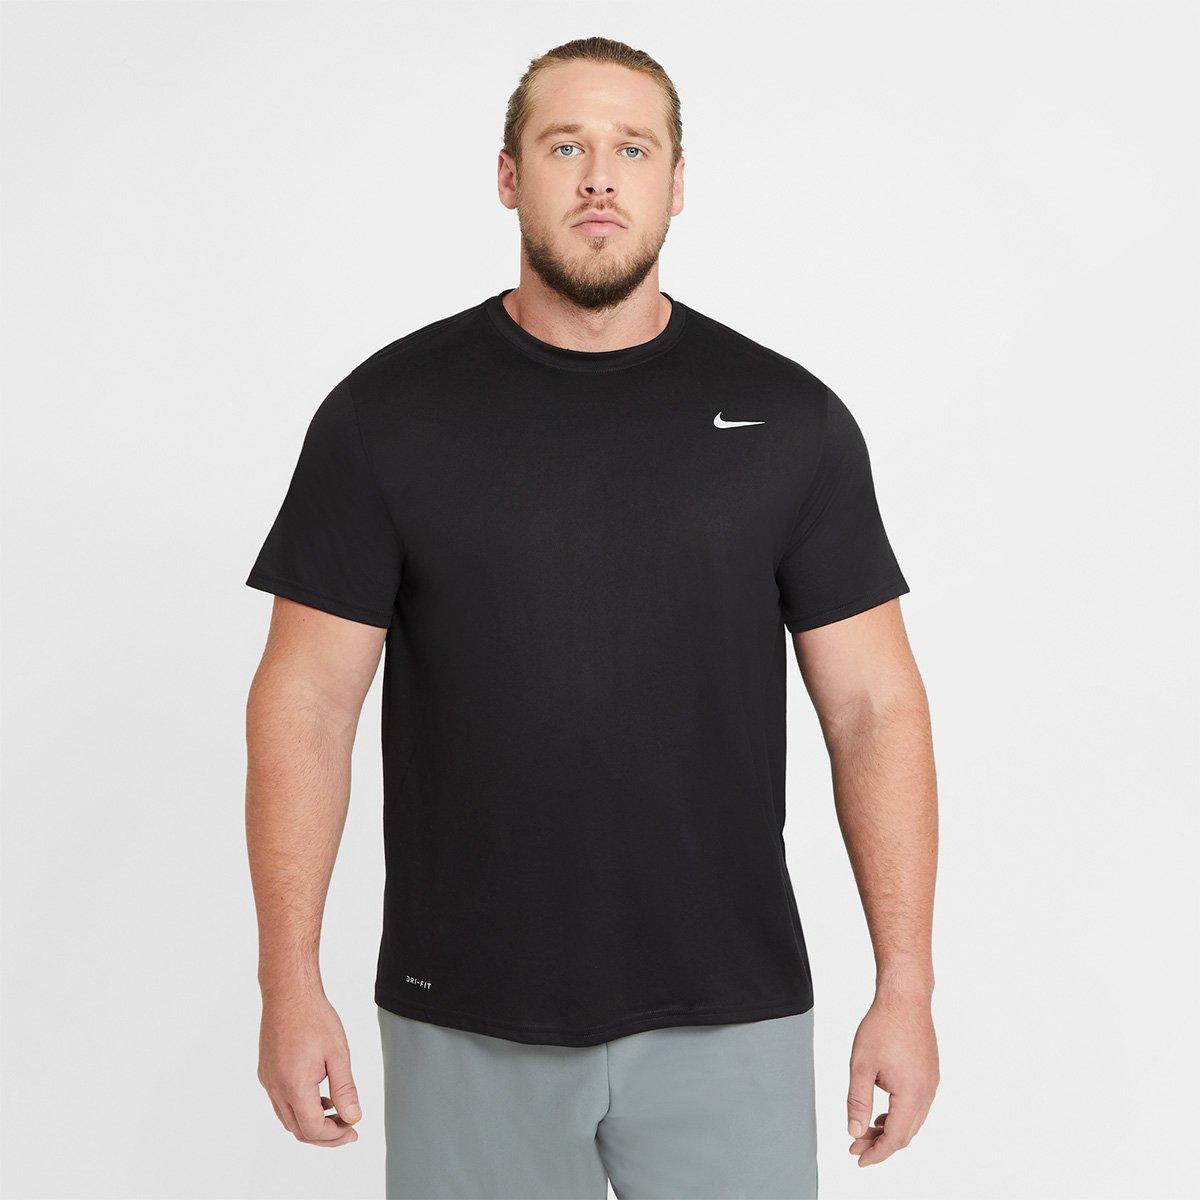 Camiseta Nike Legend 2.0 Ss Masculina - Tam: GG - 2